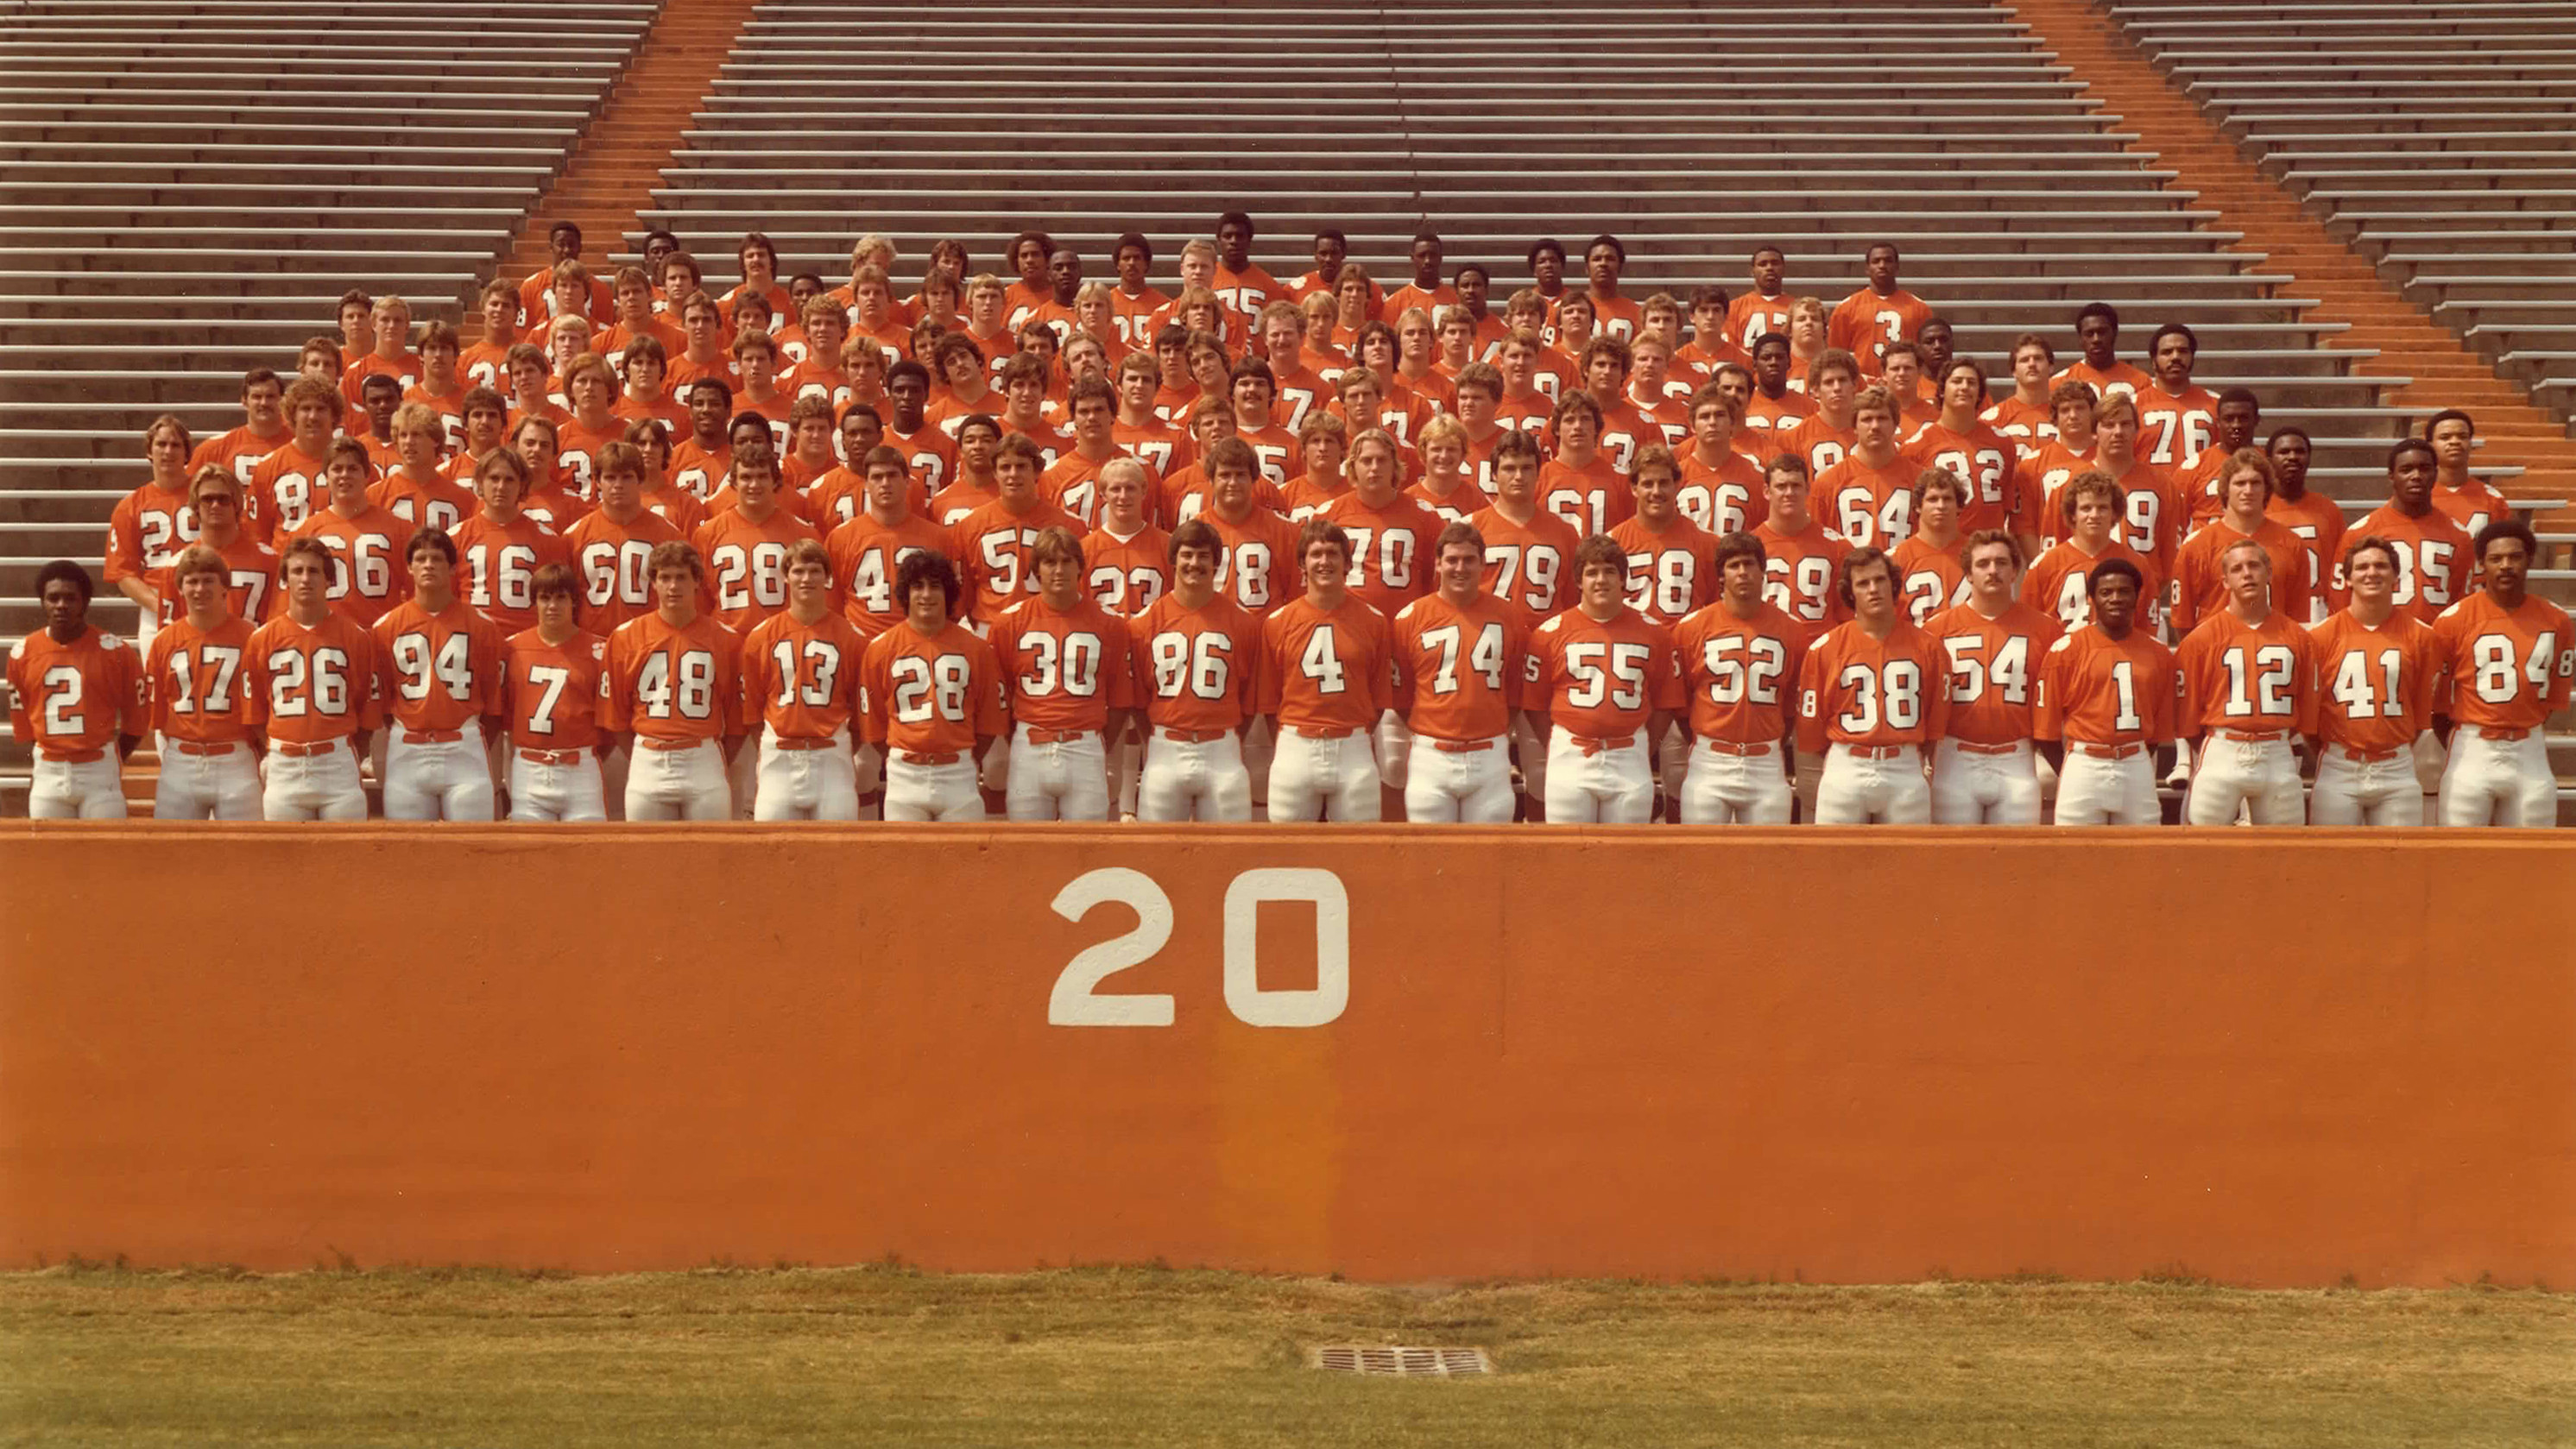 1978 Gator Bowl Review: Clemson 17, Ohio State 15 (Dec. 29, 1978 – Jacksonville, FL)